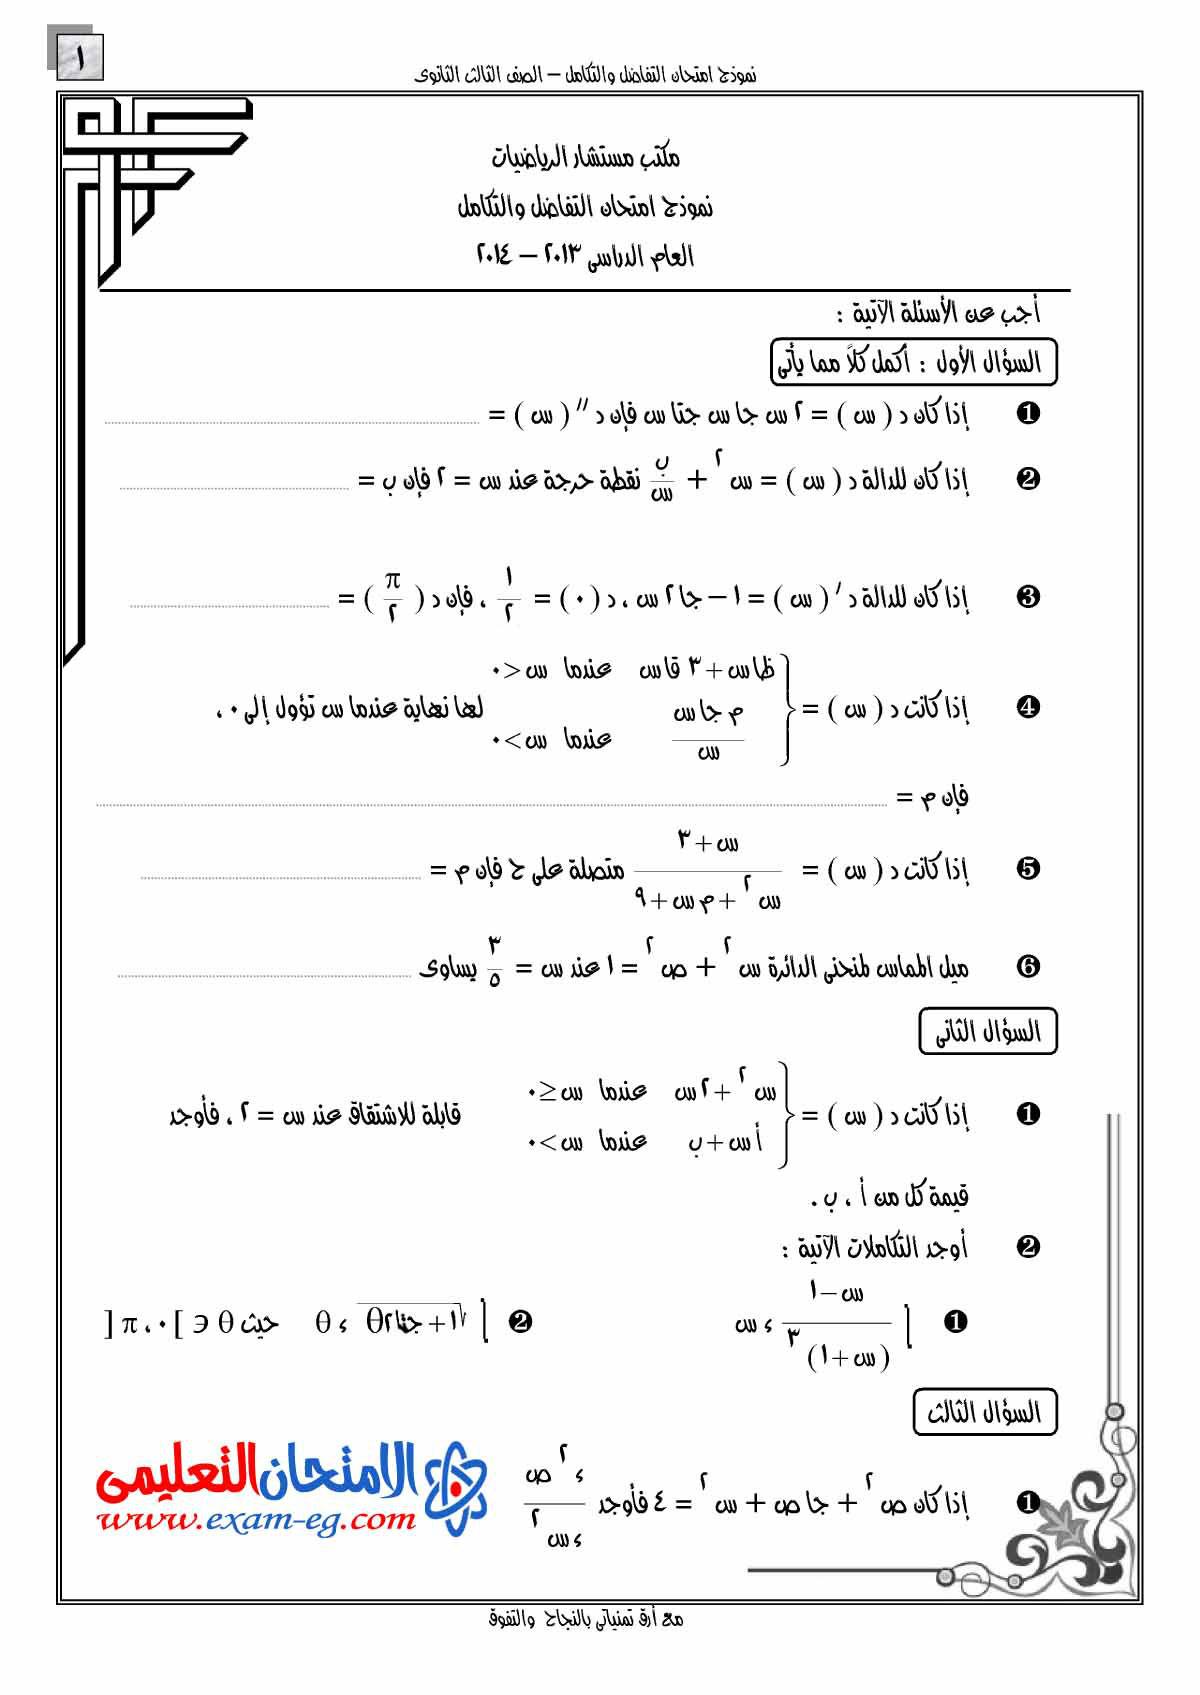 exam-eg.com_1403332834631.jpg